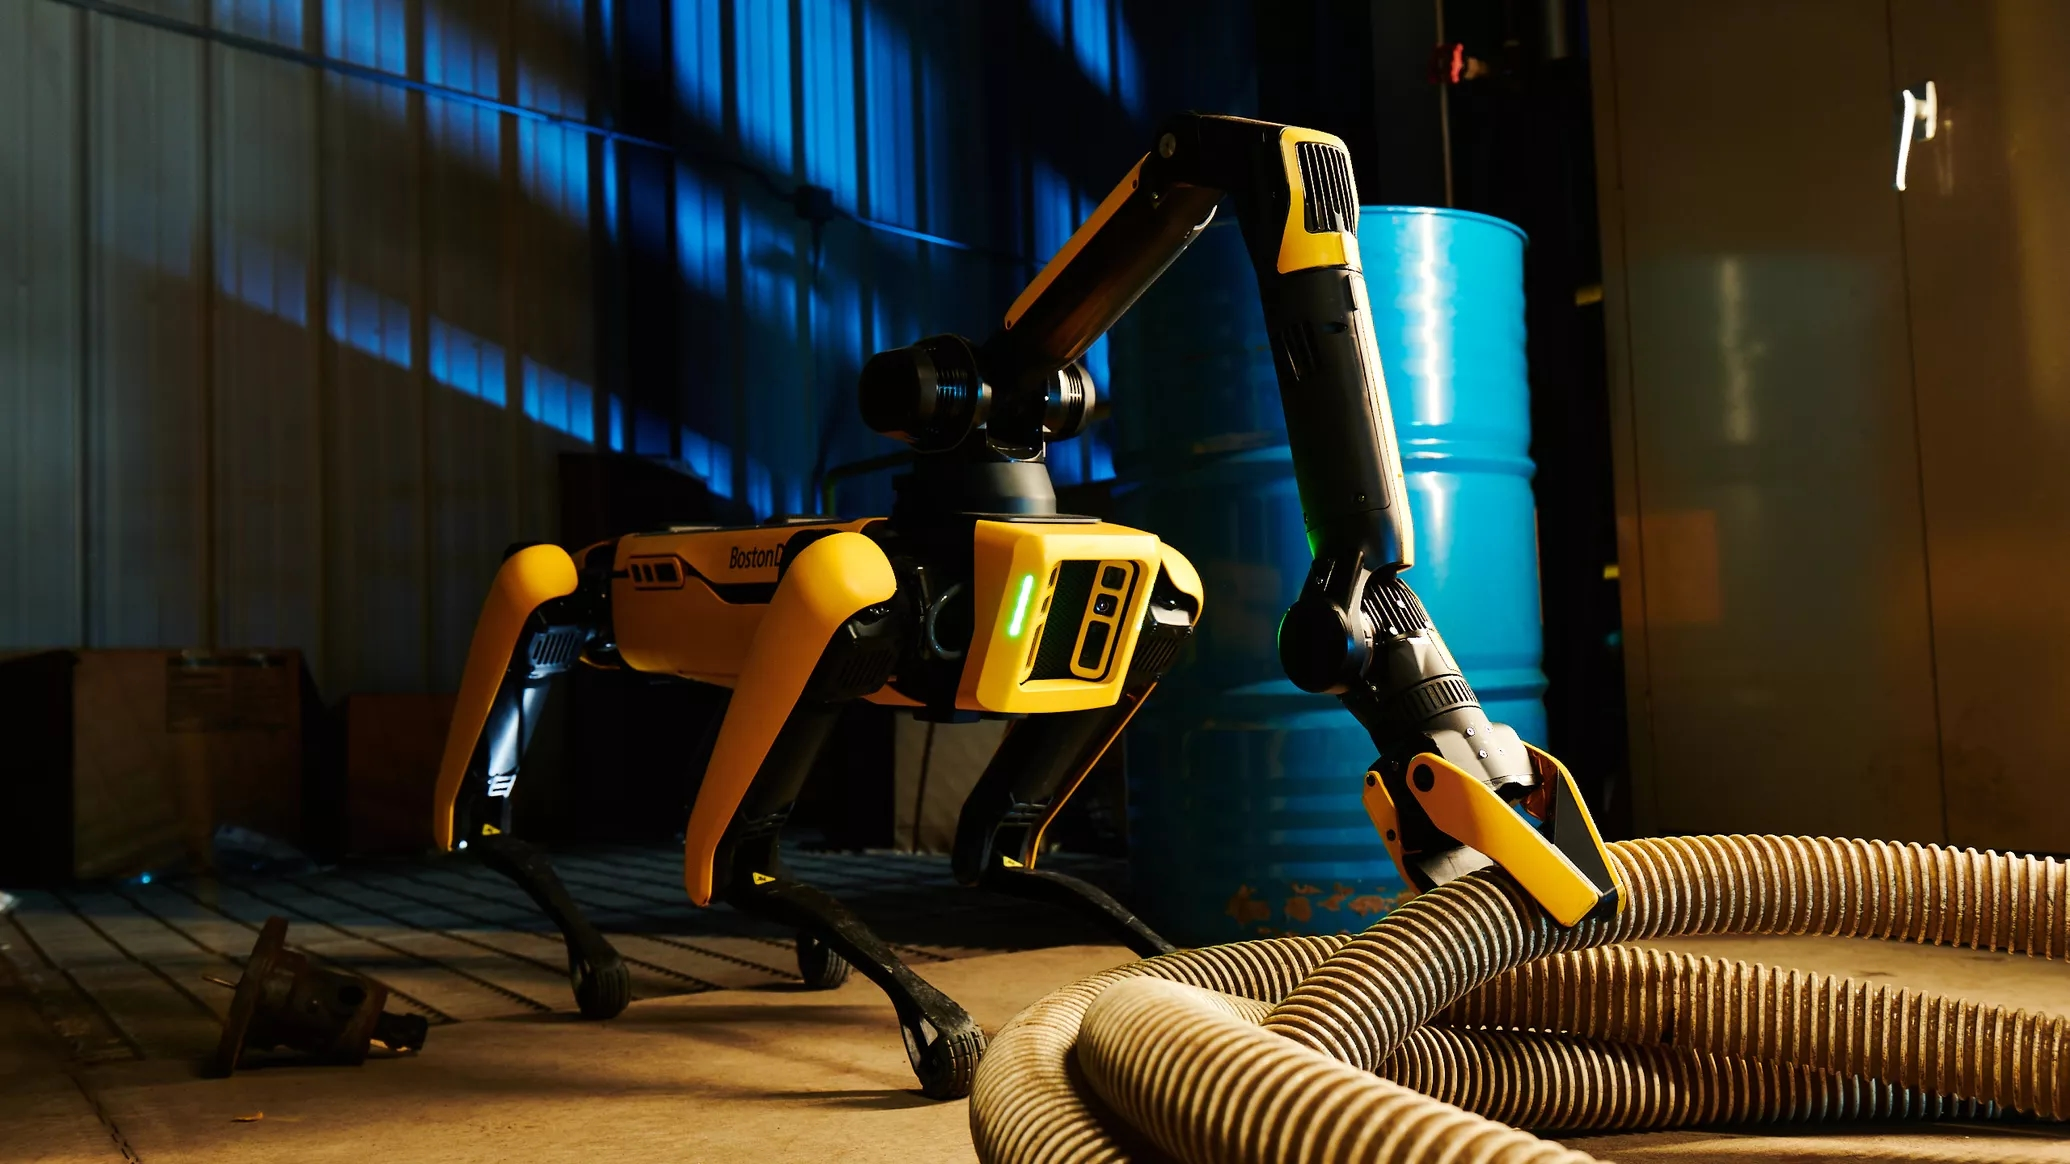 Boston Dynamics представила Spot Enterprise: обновлённая робособака с «рукой», тепловизором, 4K-камерой и док-станцией для зарядки